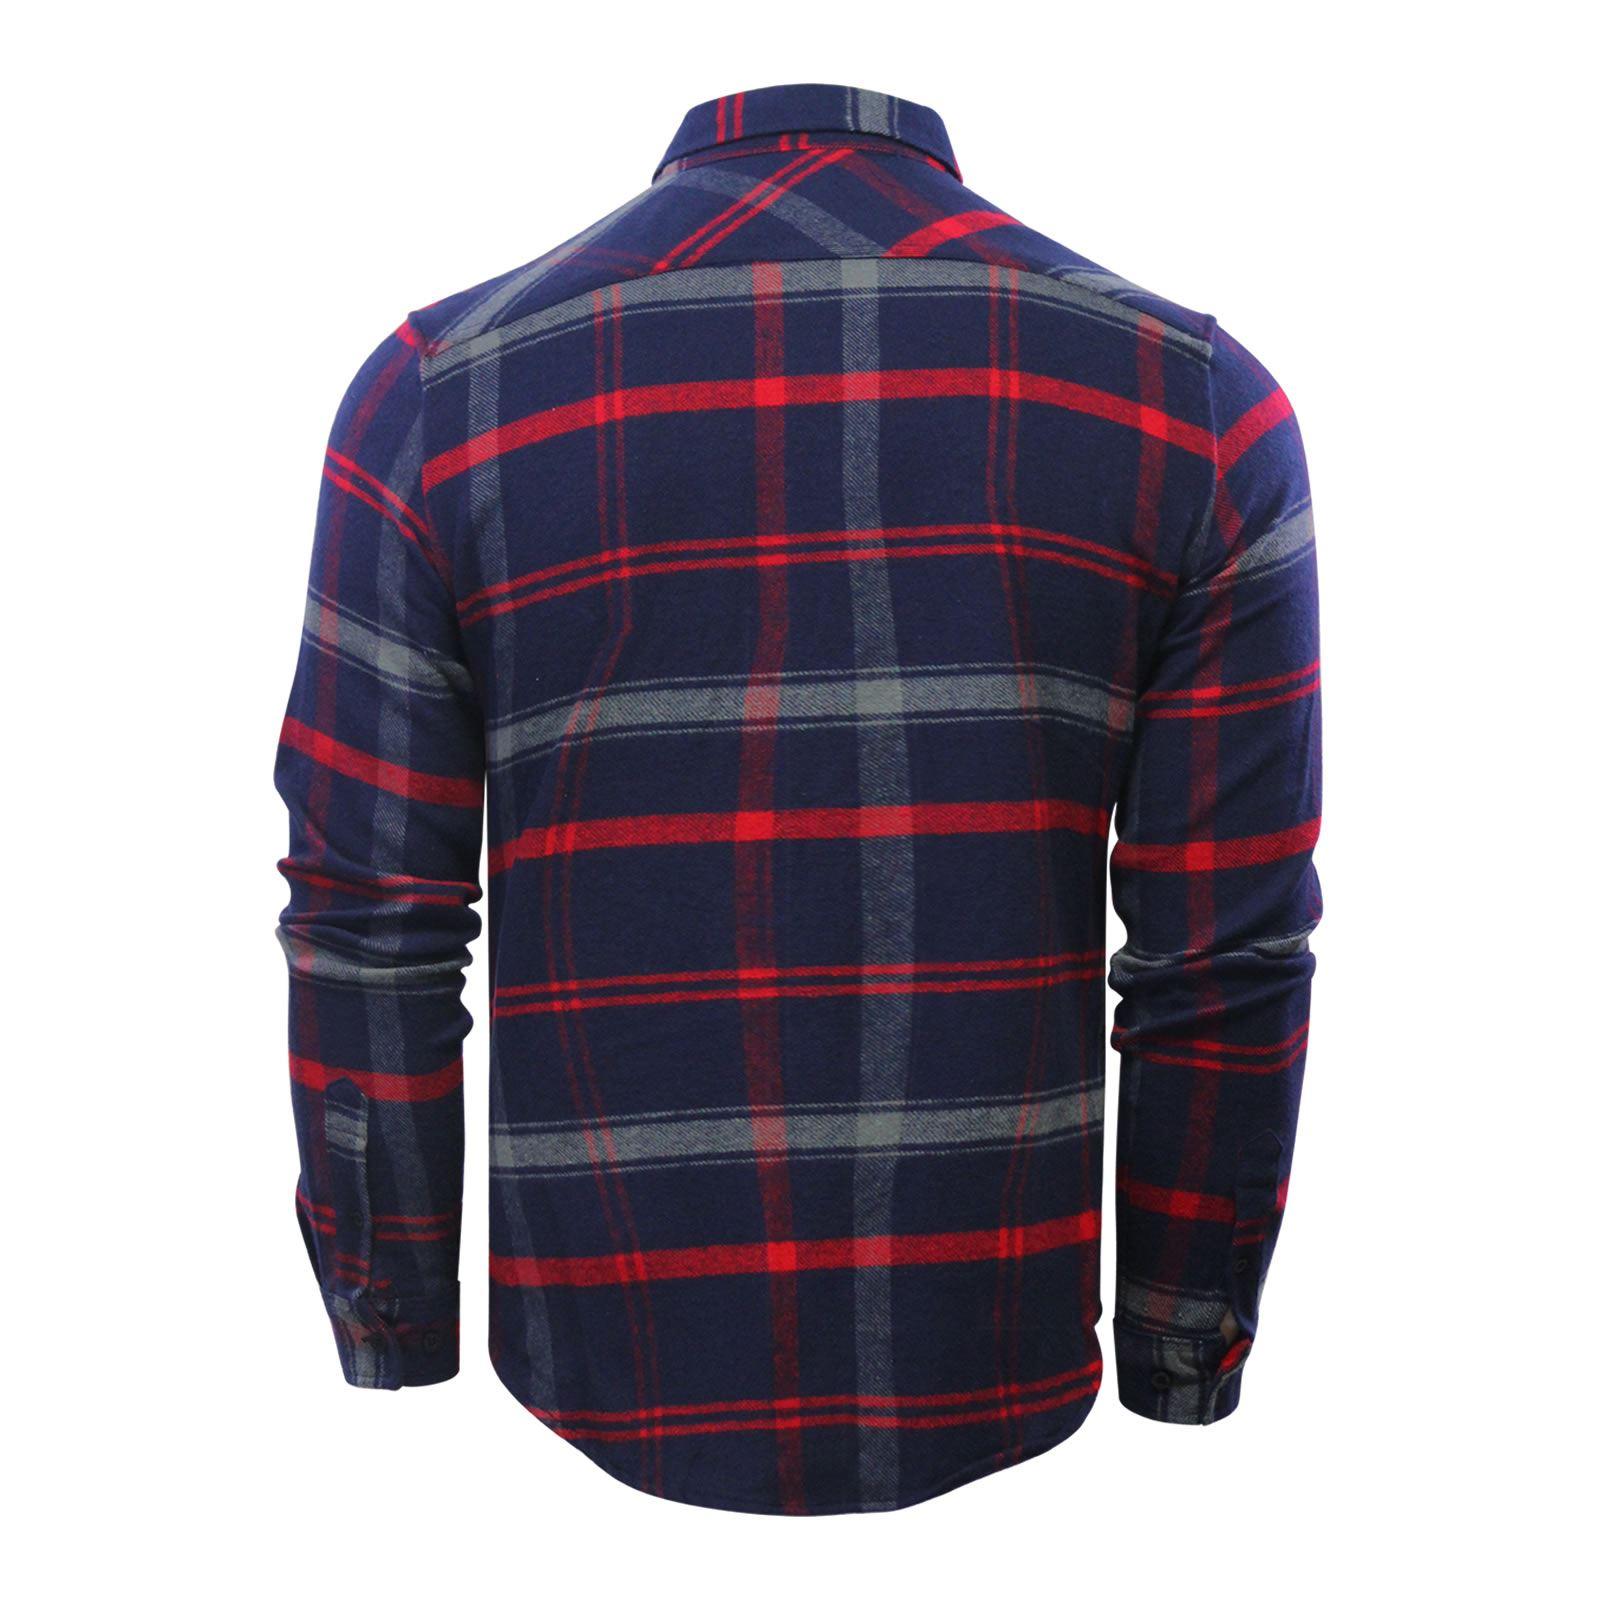 Crosshatch-Fitzroya-Mens-Check-Shirt-Flannel-Brushed-Cotton-Long-Sleeve miniature 3